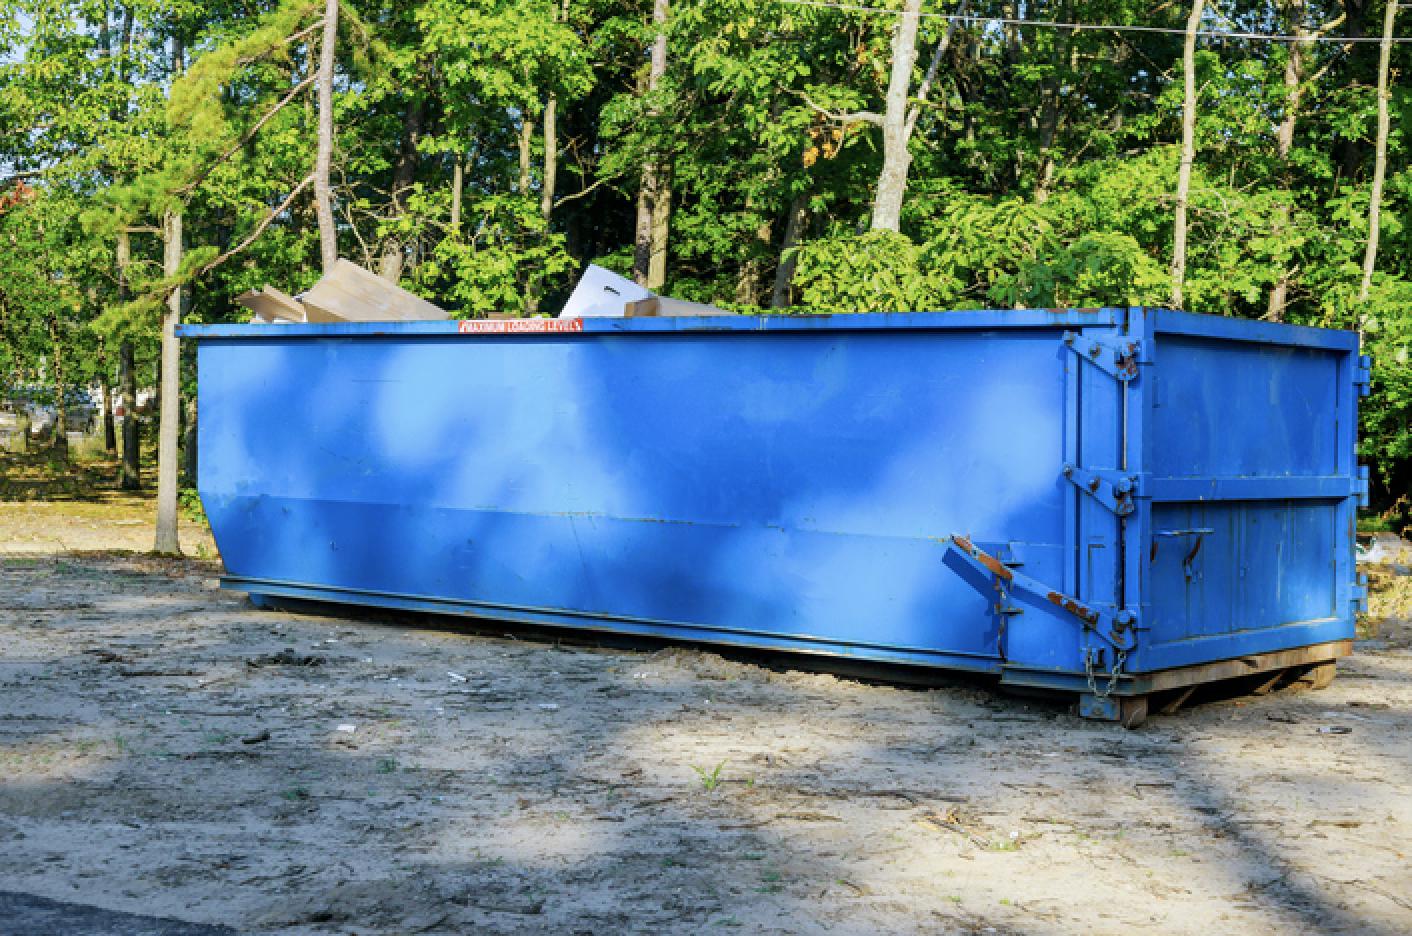 Dumpster rental in Brookfield, Wisconsin